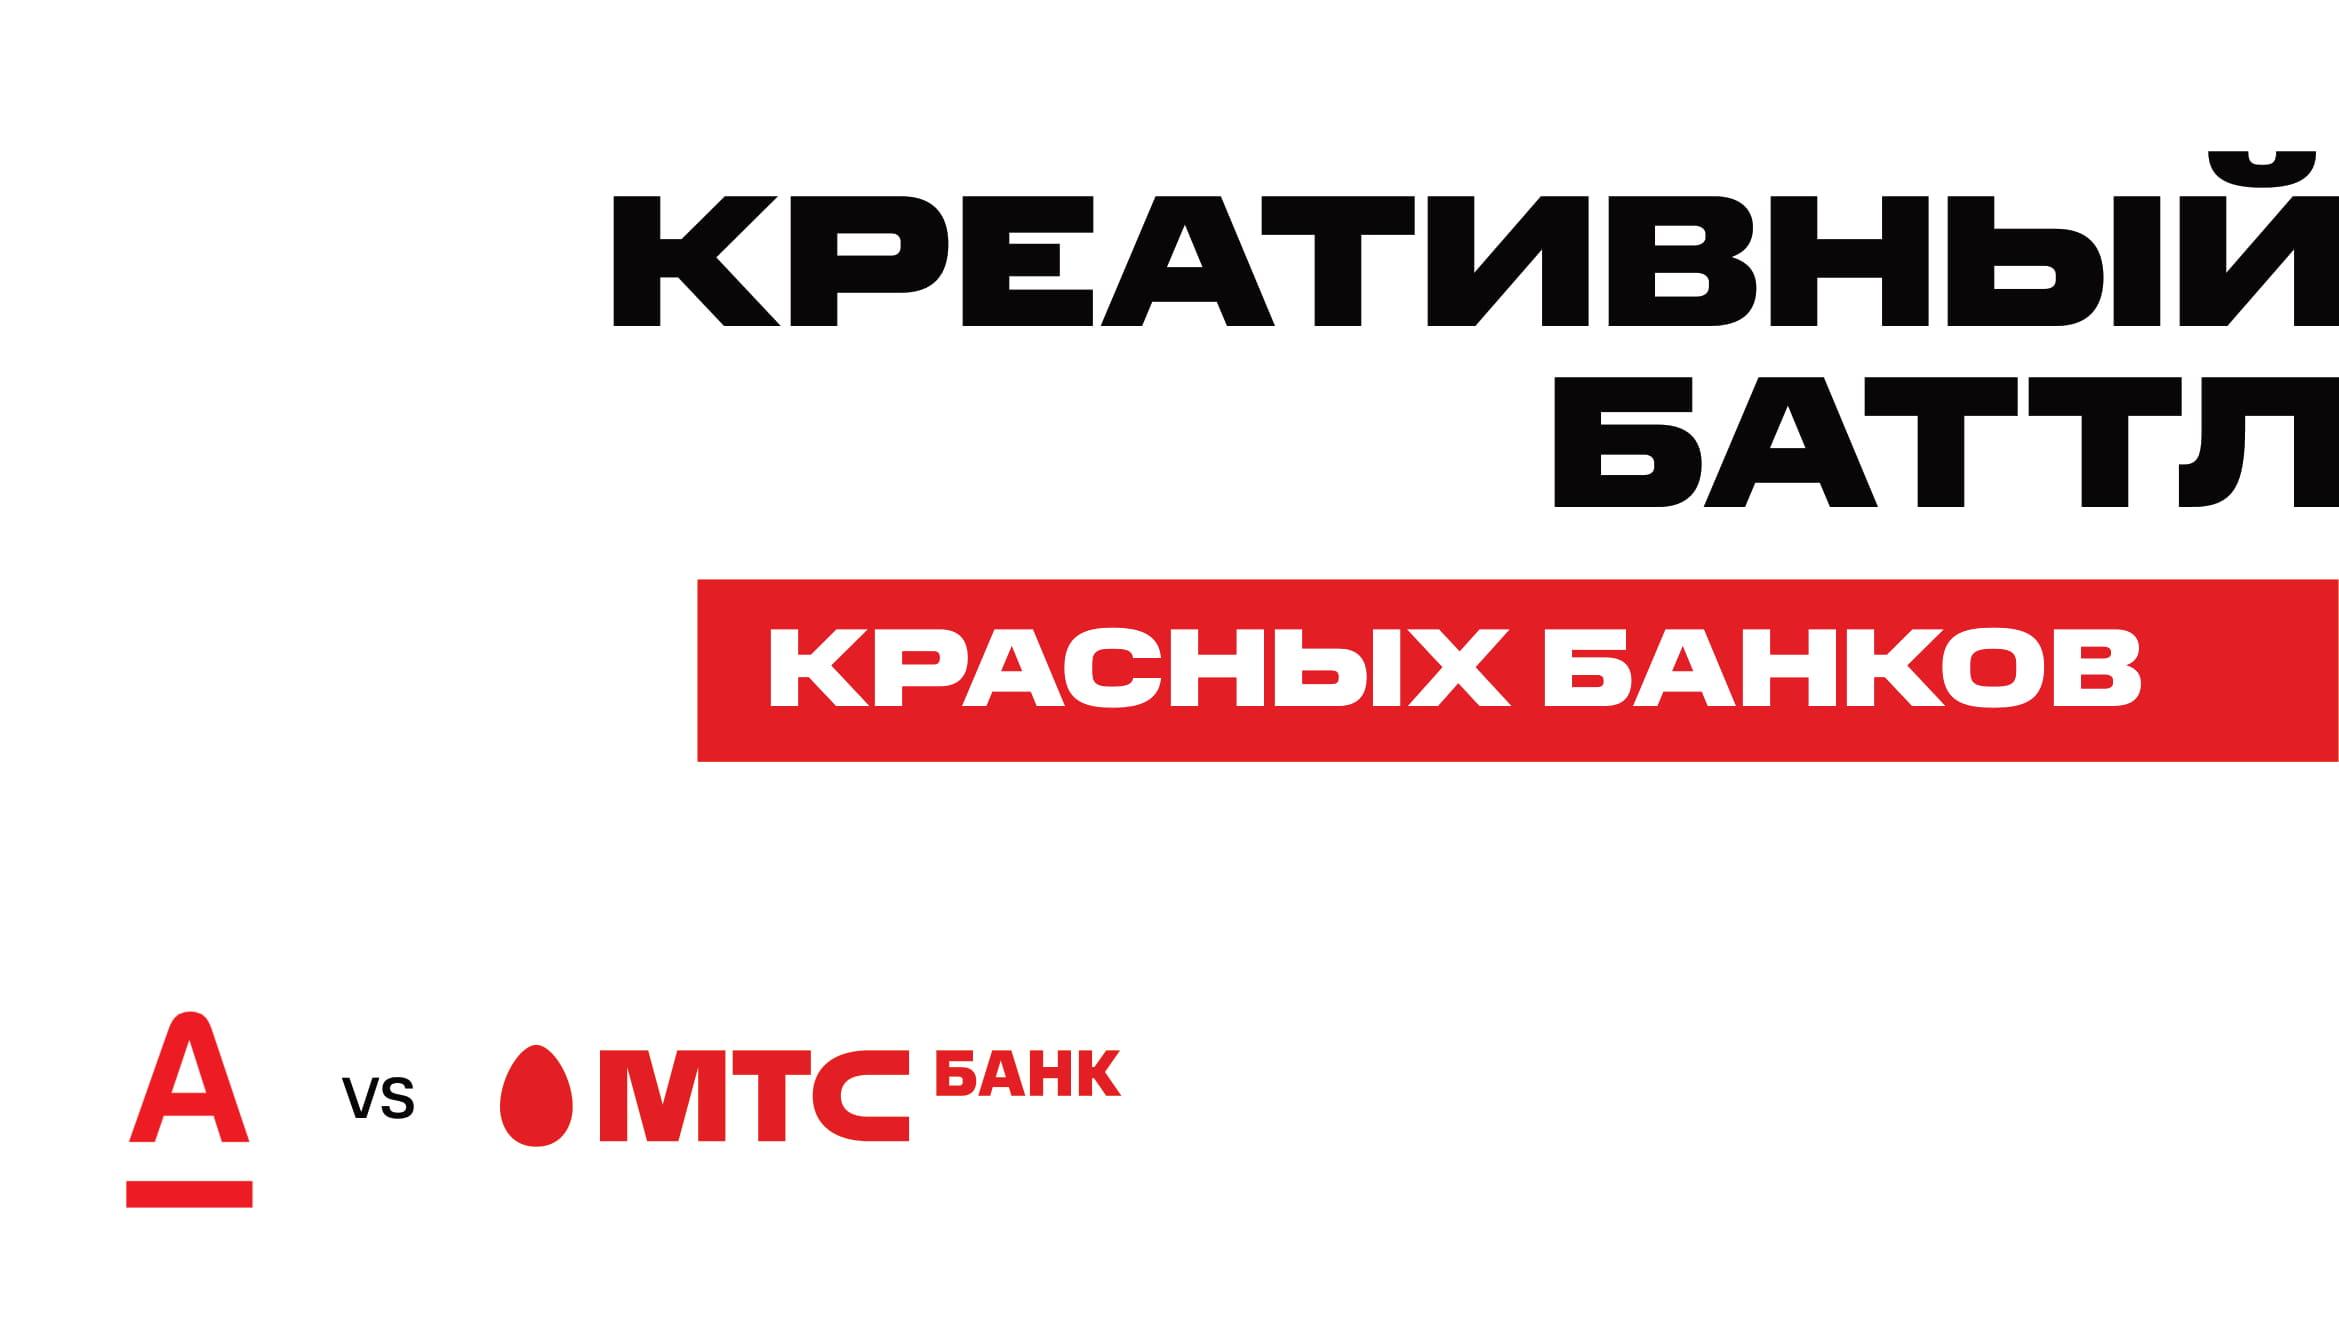 RFA_Креатив-года-2020_МТС-Банк-VS-Альфа-Банк-01